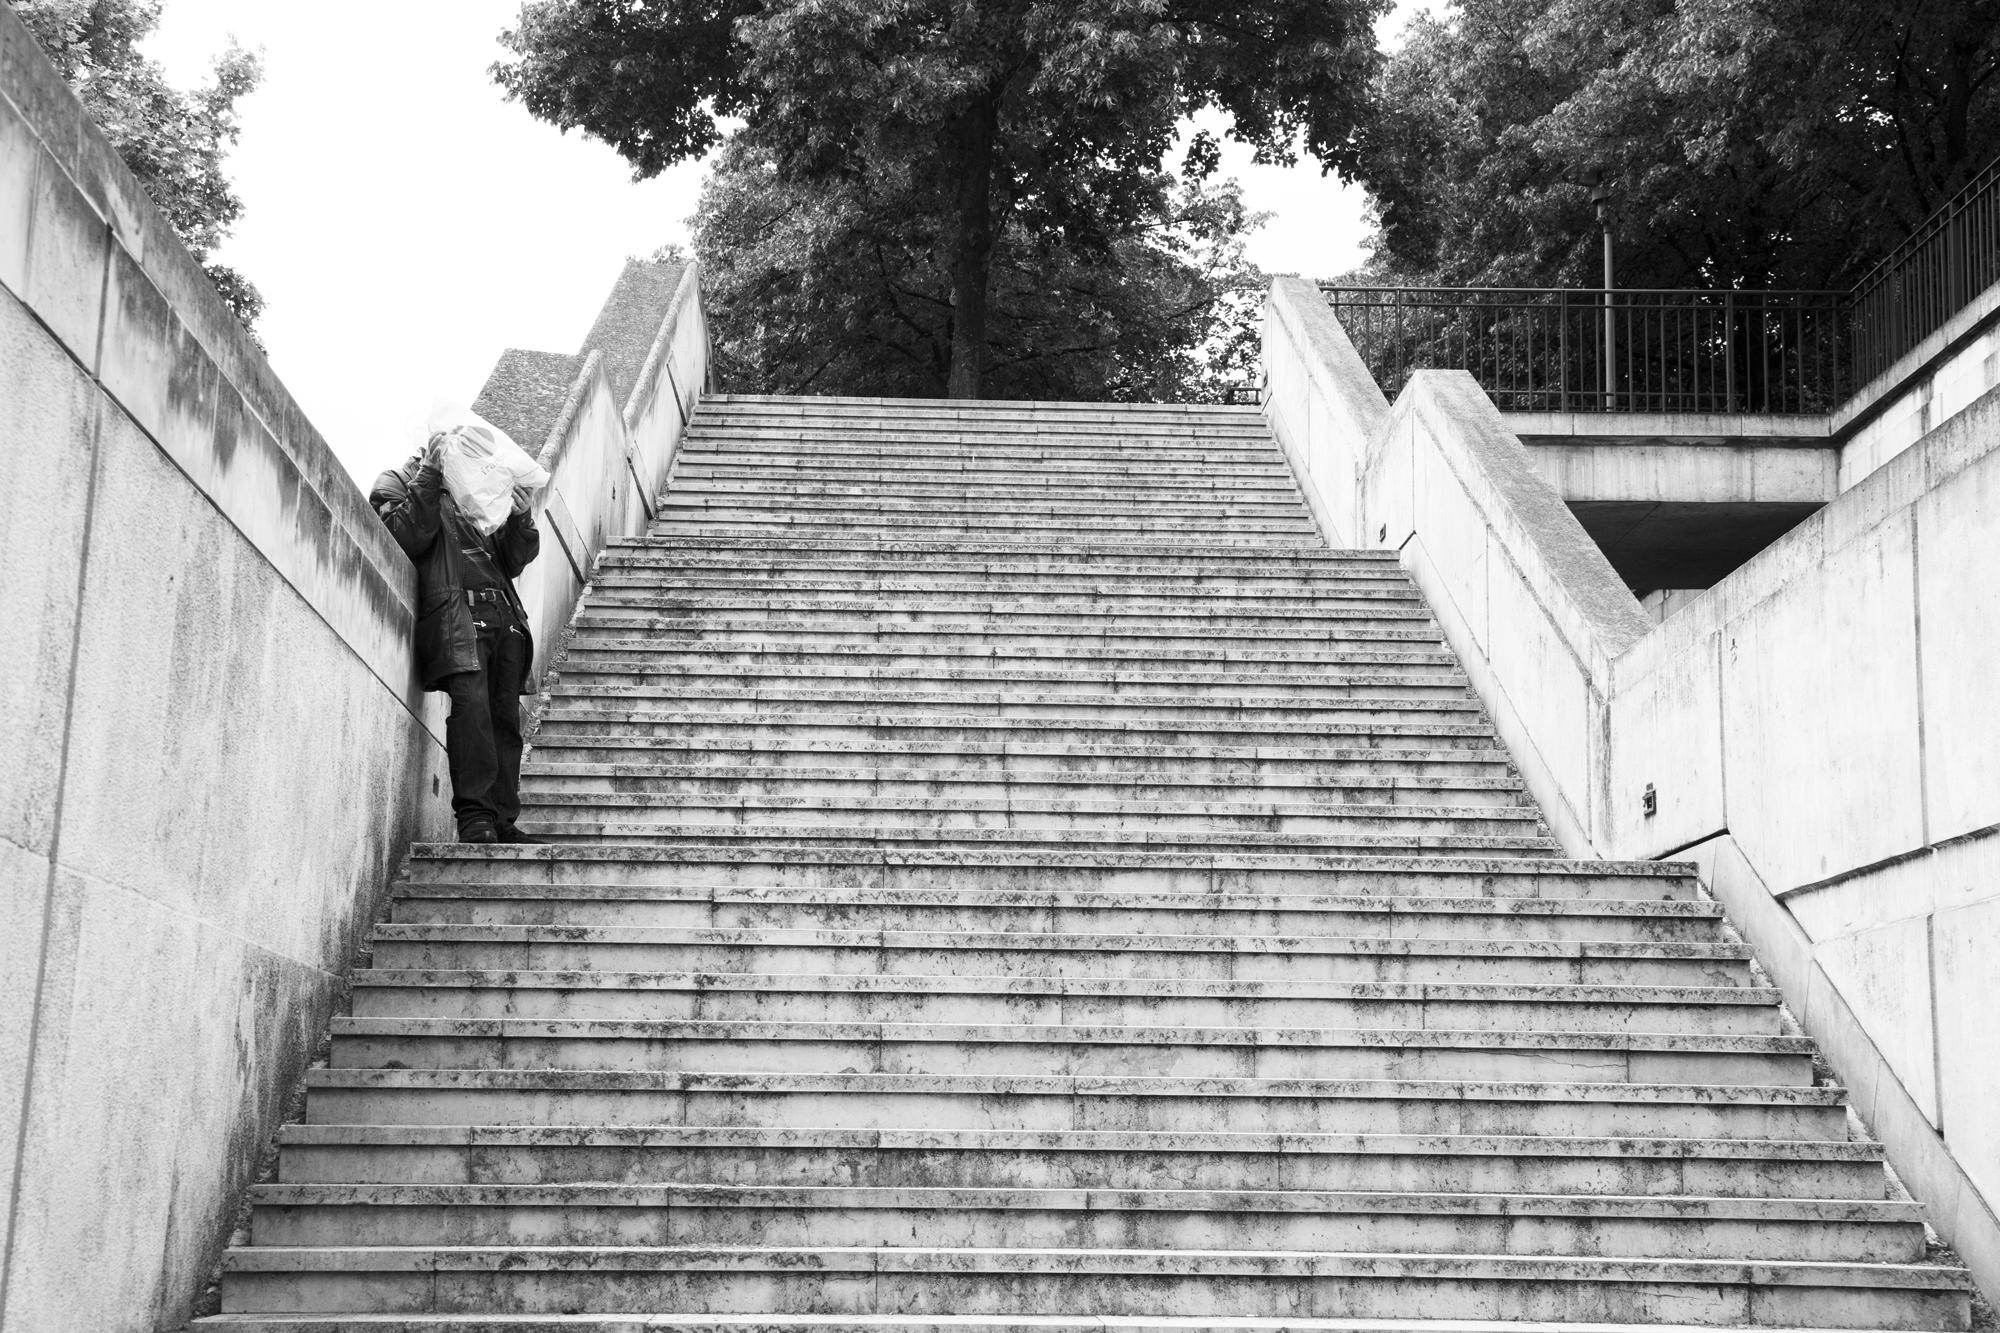 """Being under the radar"" - Parc de Bercy, Paris (2019). © Clémence Rougetet"